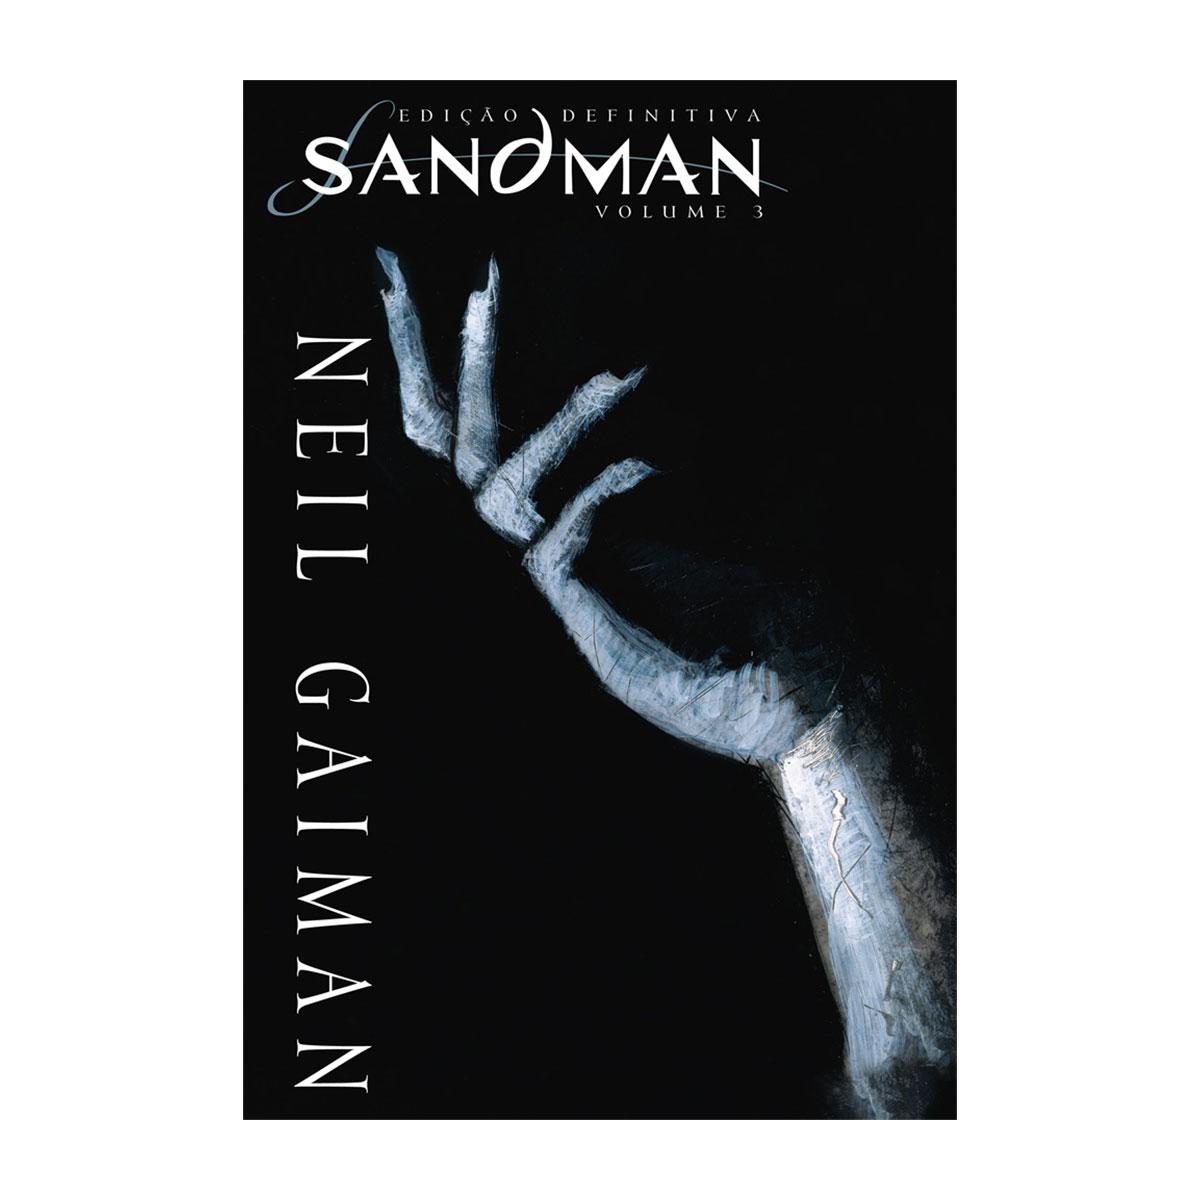 Graphic Novel Sandman Edi��o Definitiva Vol. 3